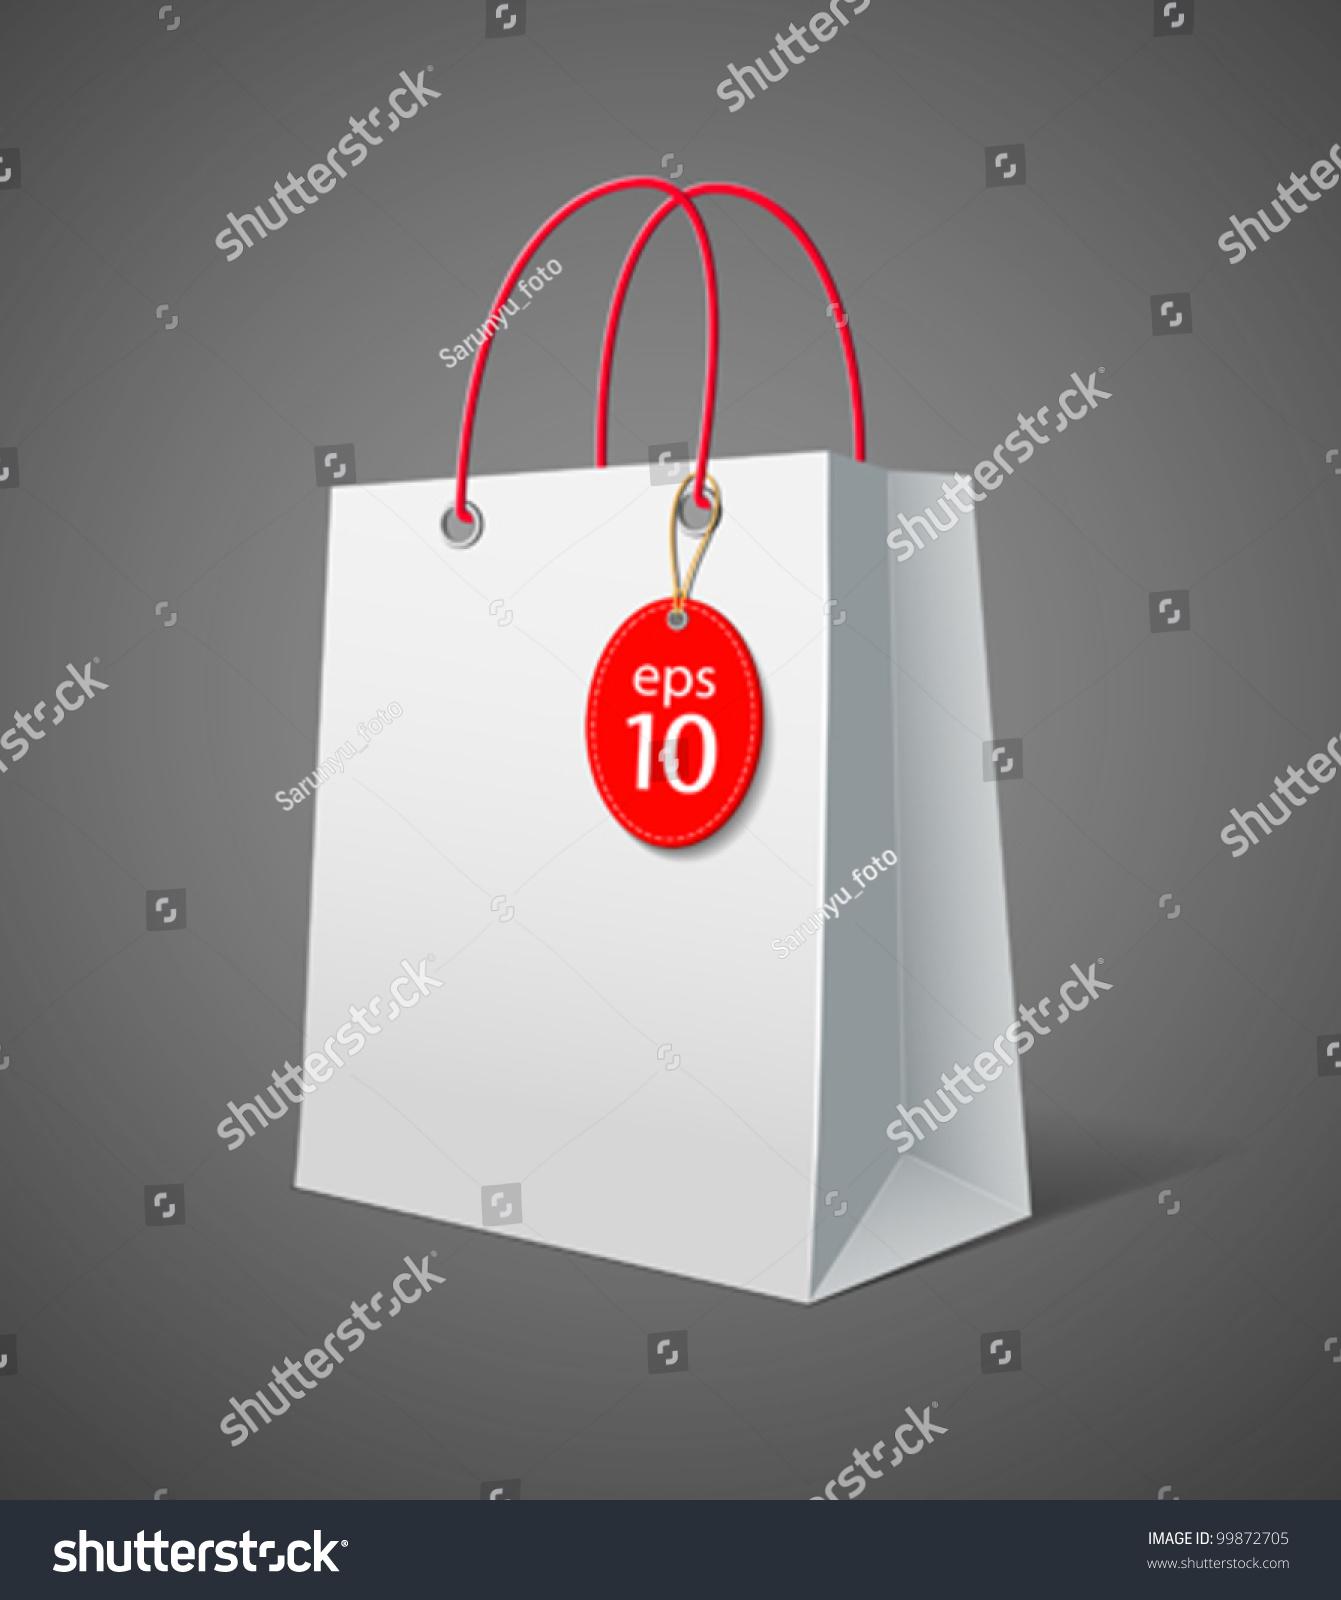 Paper bag vector - White Paper Bag Vector Illustration